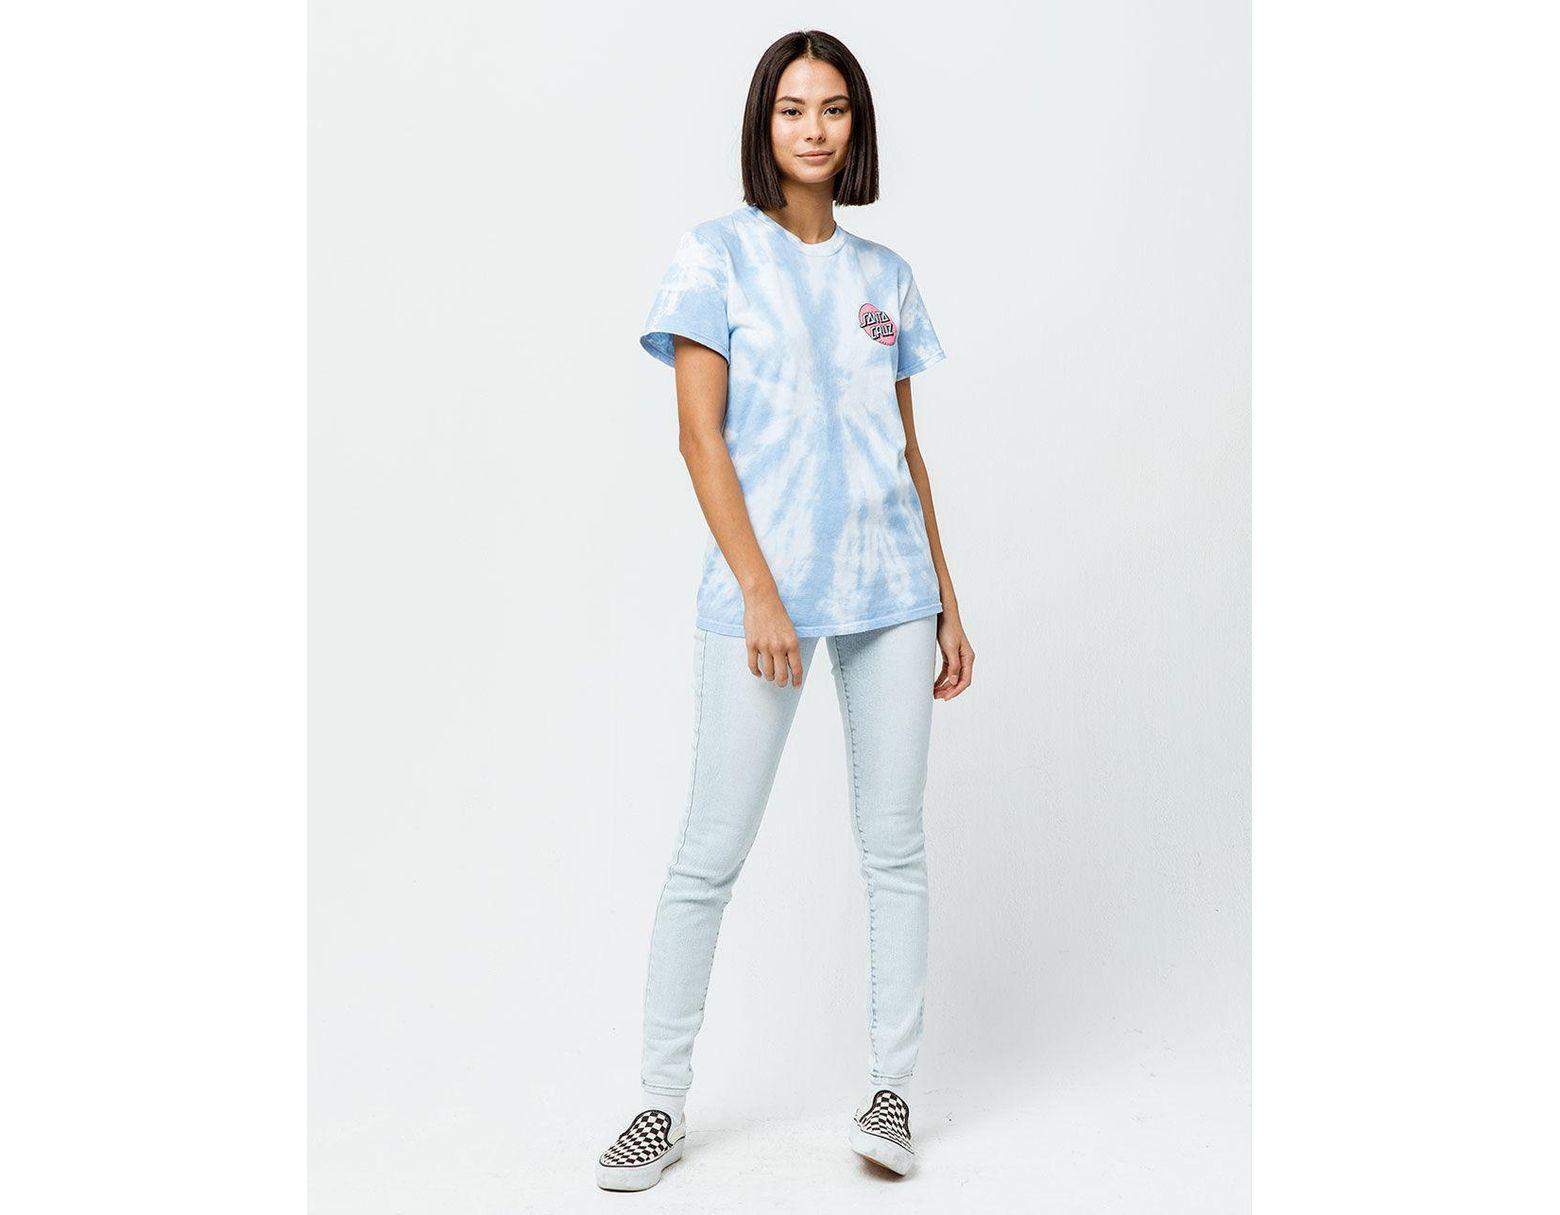 bf7d1fa06f Santa Cruz Convert Tie Dye Womens Tee in Blue - Lyst